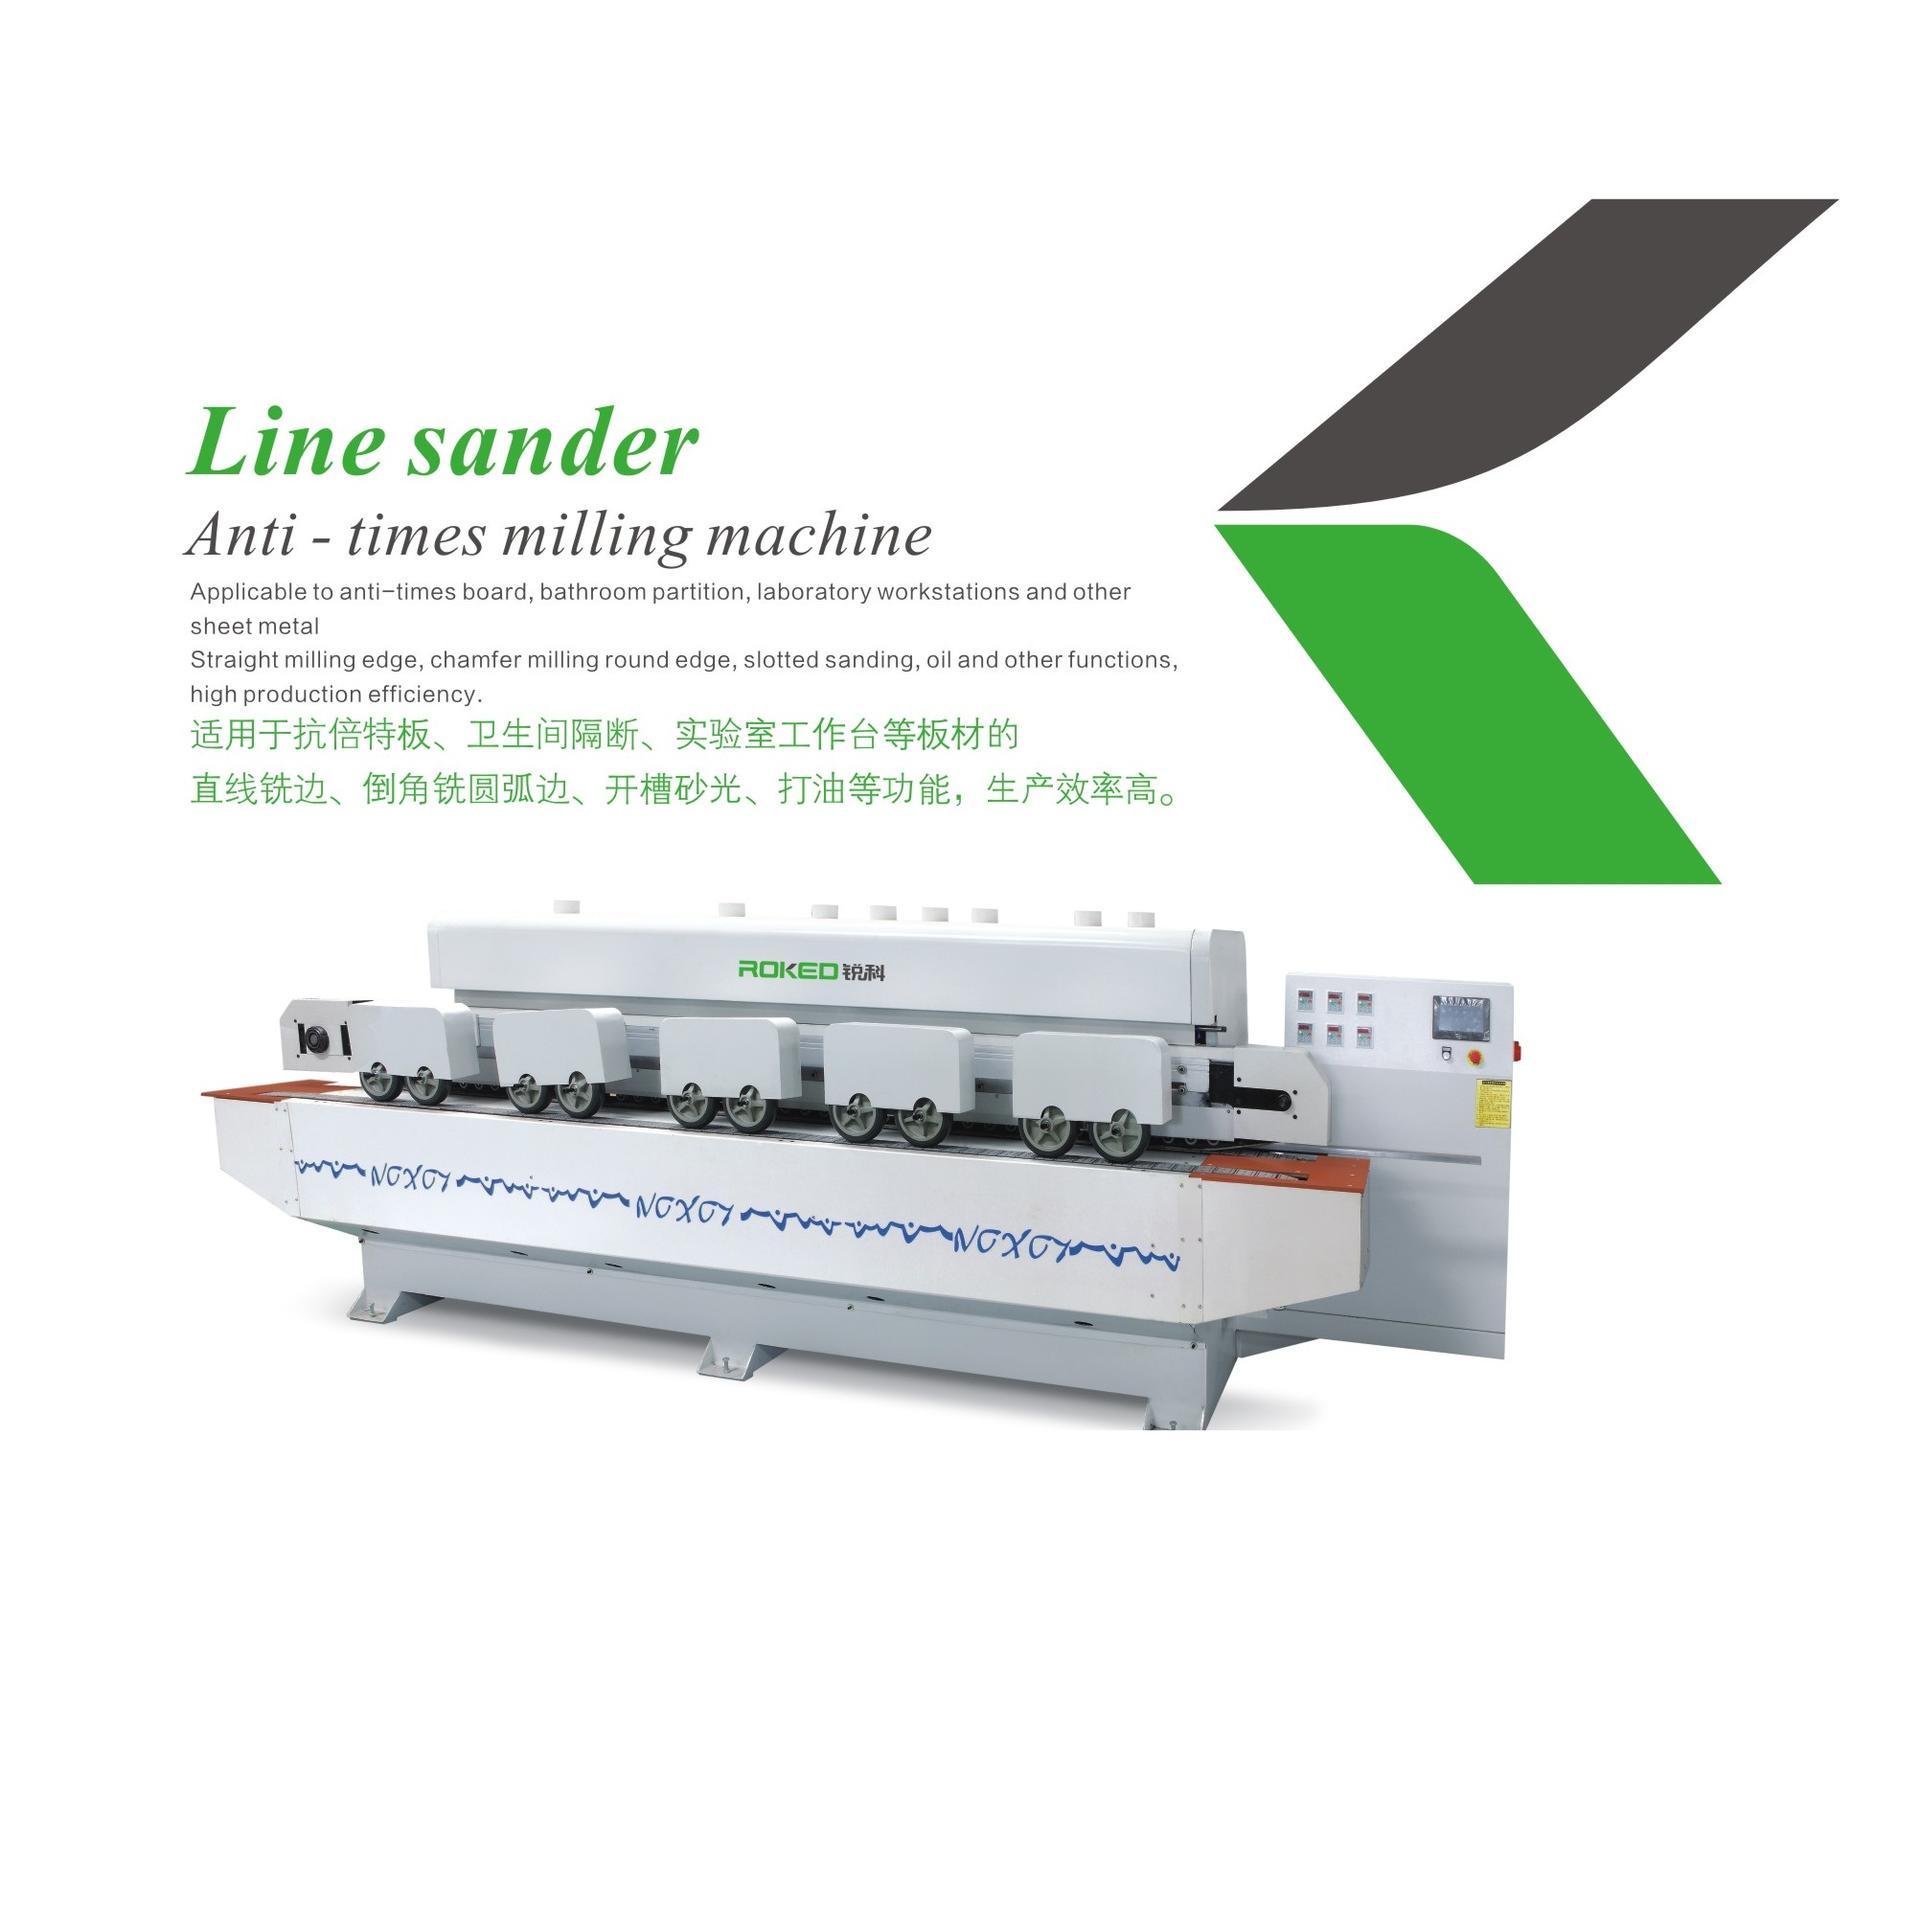 SANHOMT/Yongjili/ROKED   Line sander Anti - times milling machine  RK-KXA-2K2X1S1H1P